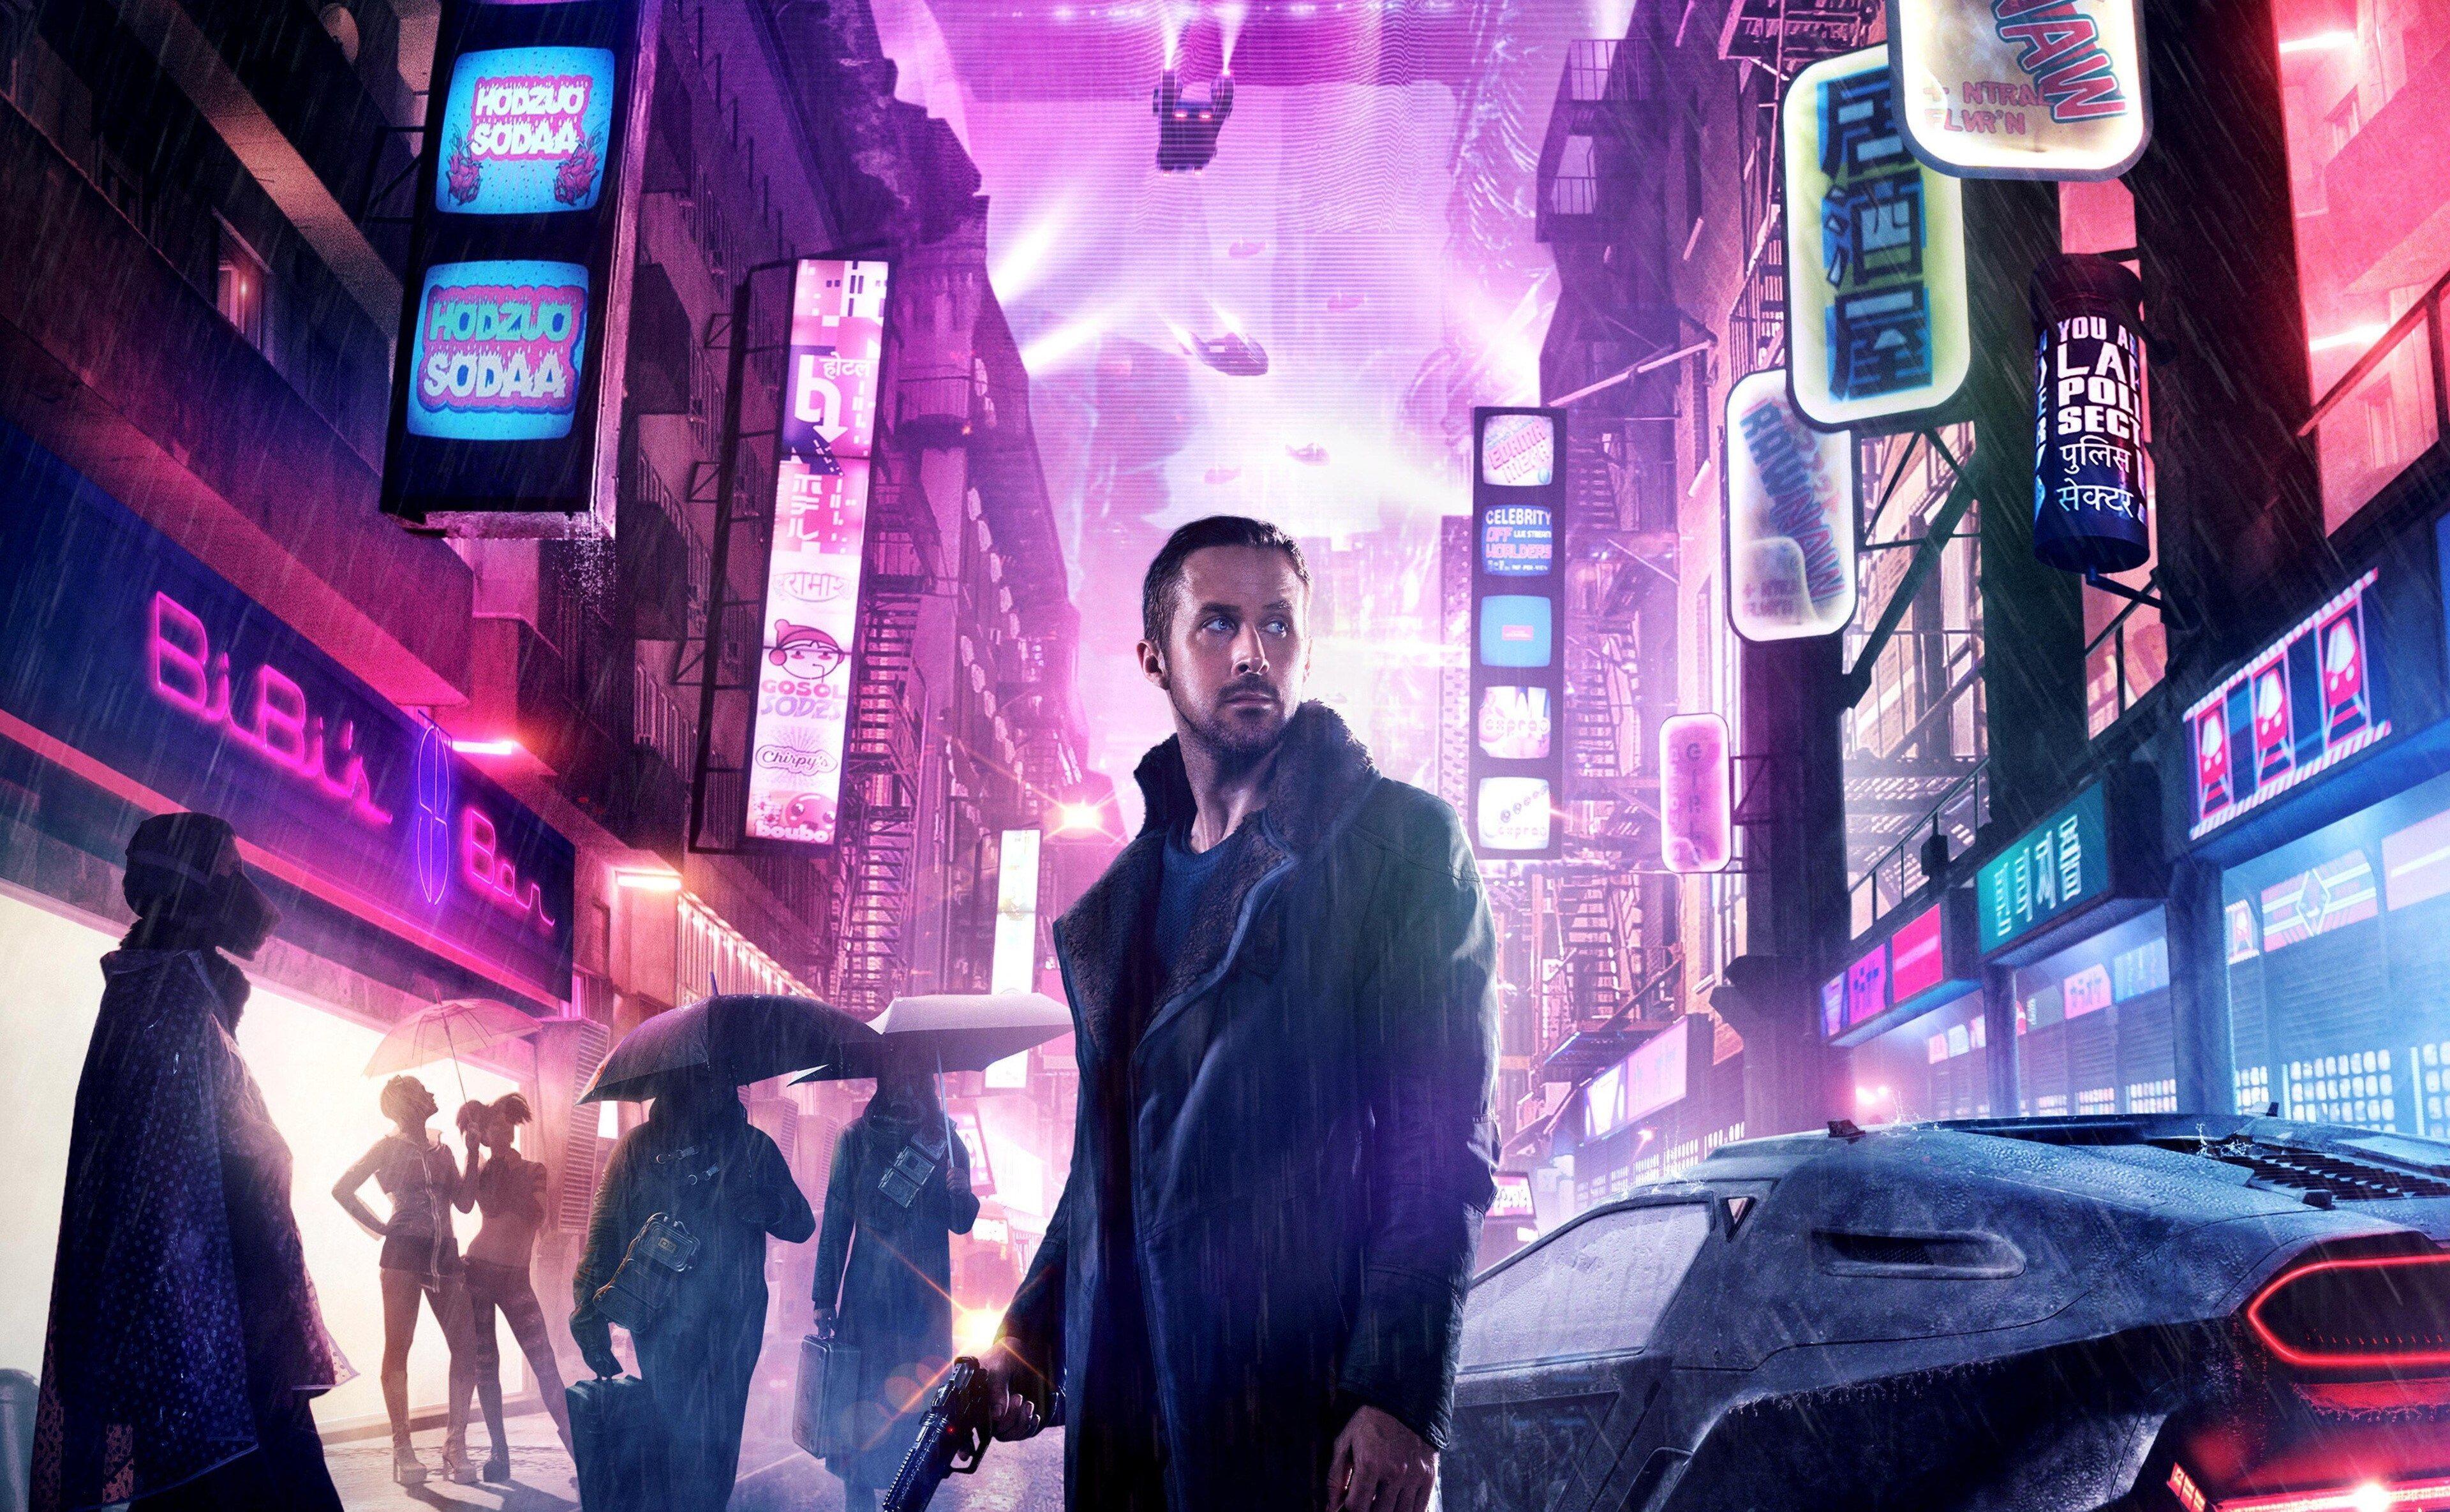 3840x2370 Blade Runner 2049 4k Wallpaper For Wide Screen Blade Runner Blade Runner 2049 Blade Runner Wallpaper